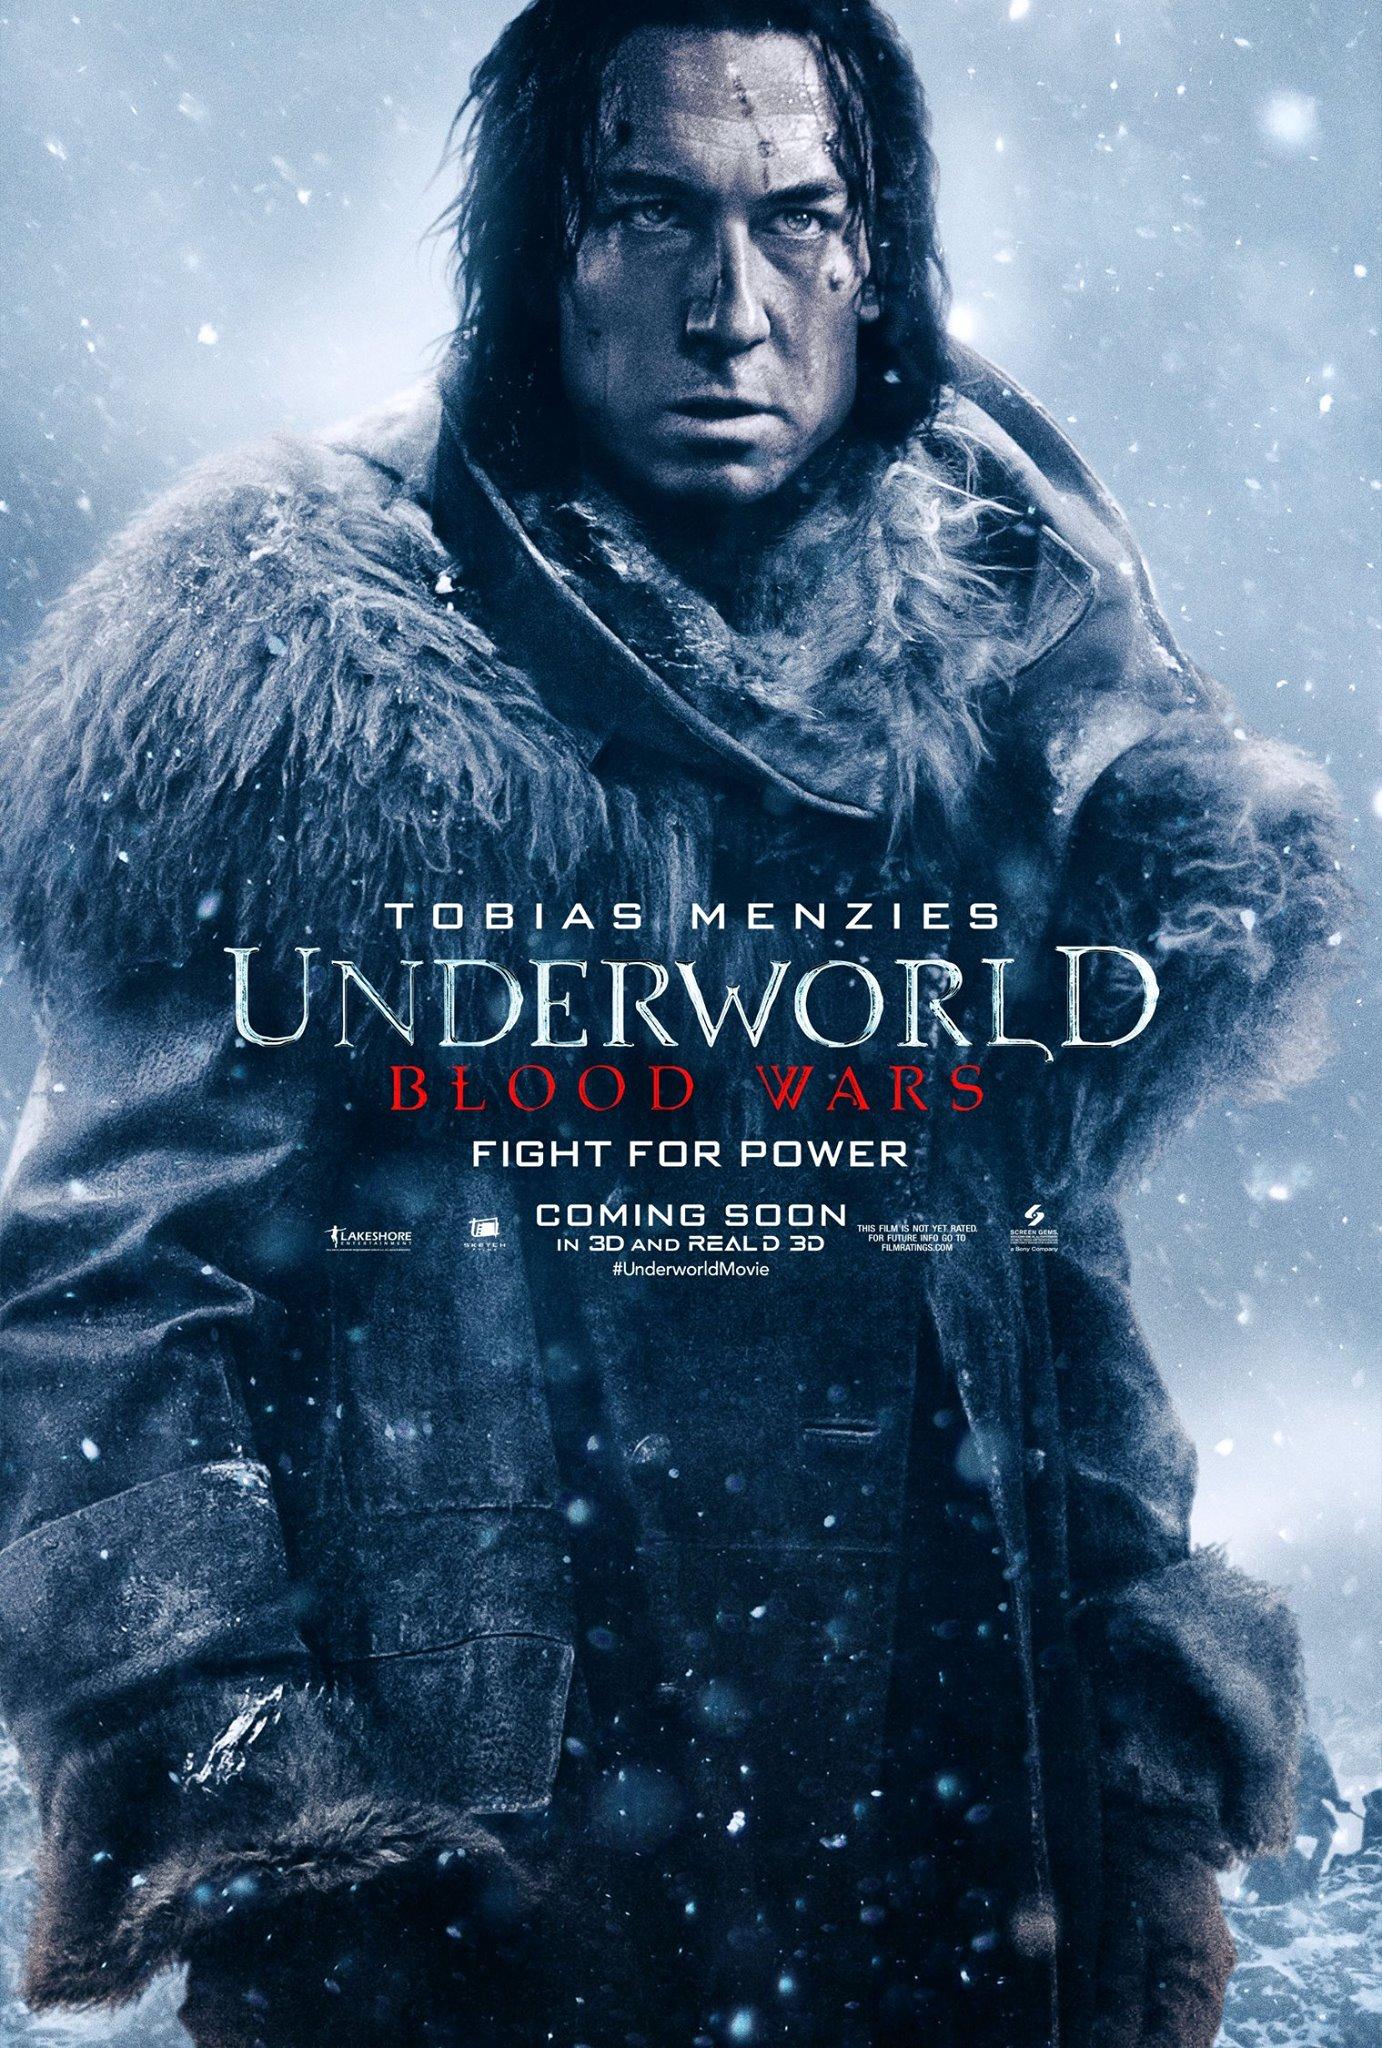 szmk_underworld_blood_wars_verozon_4.jpg